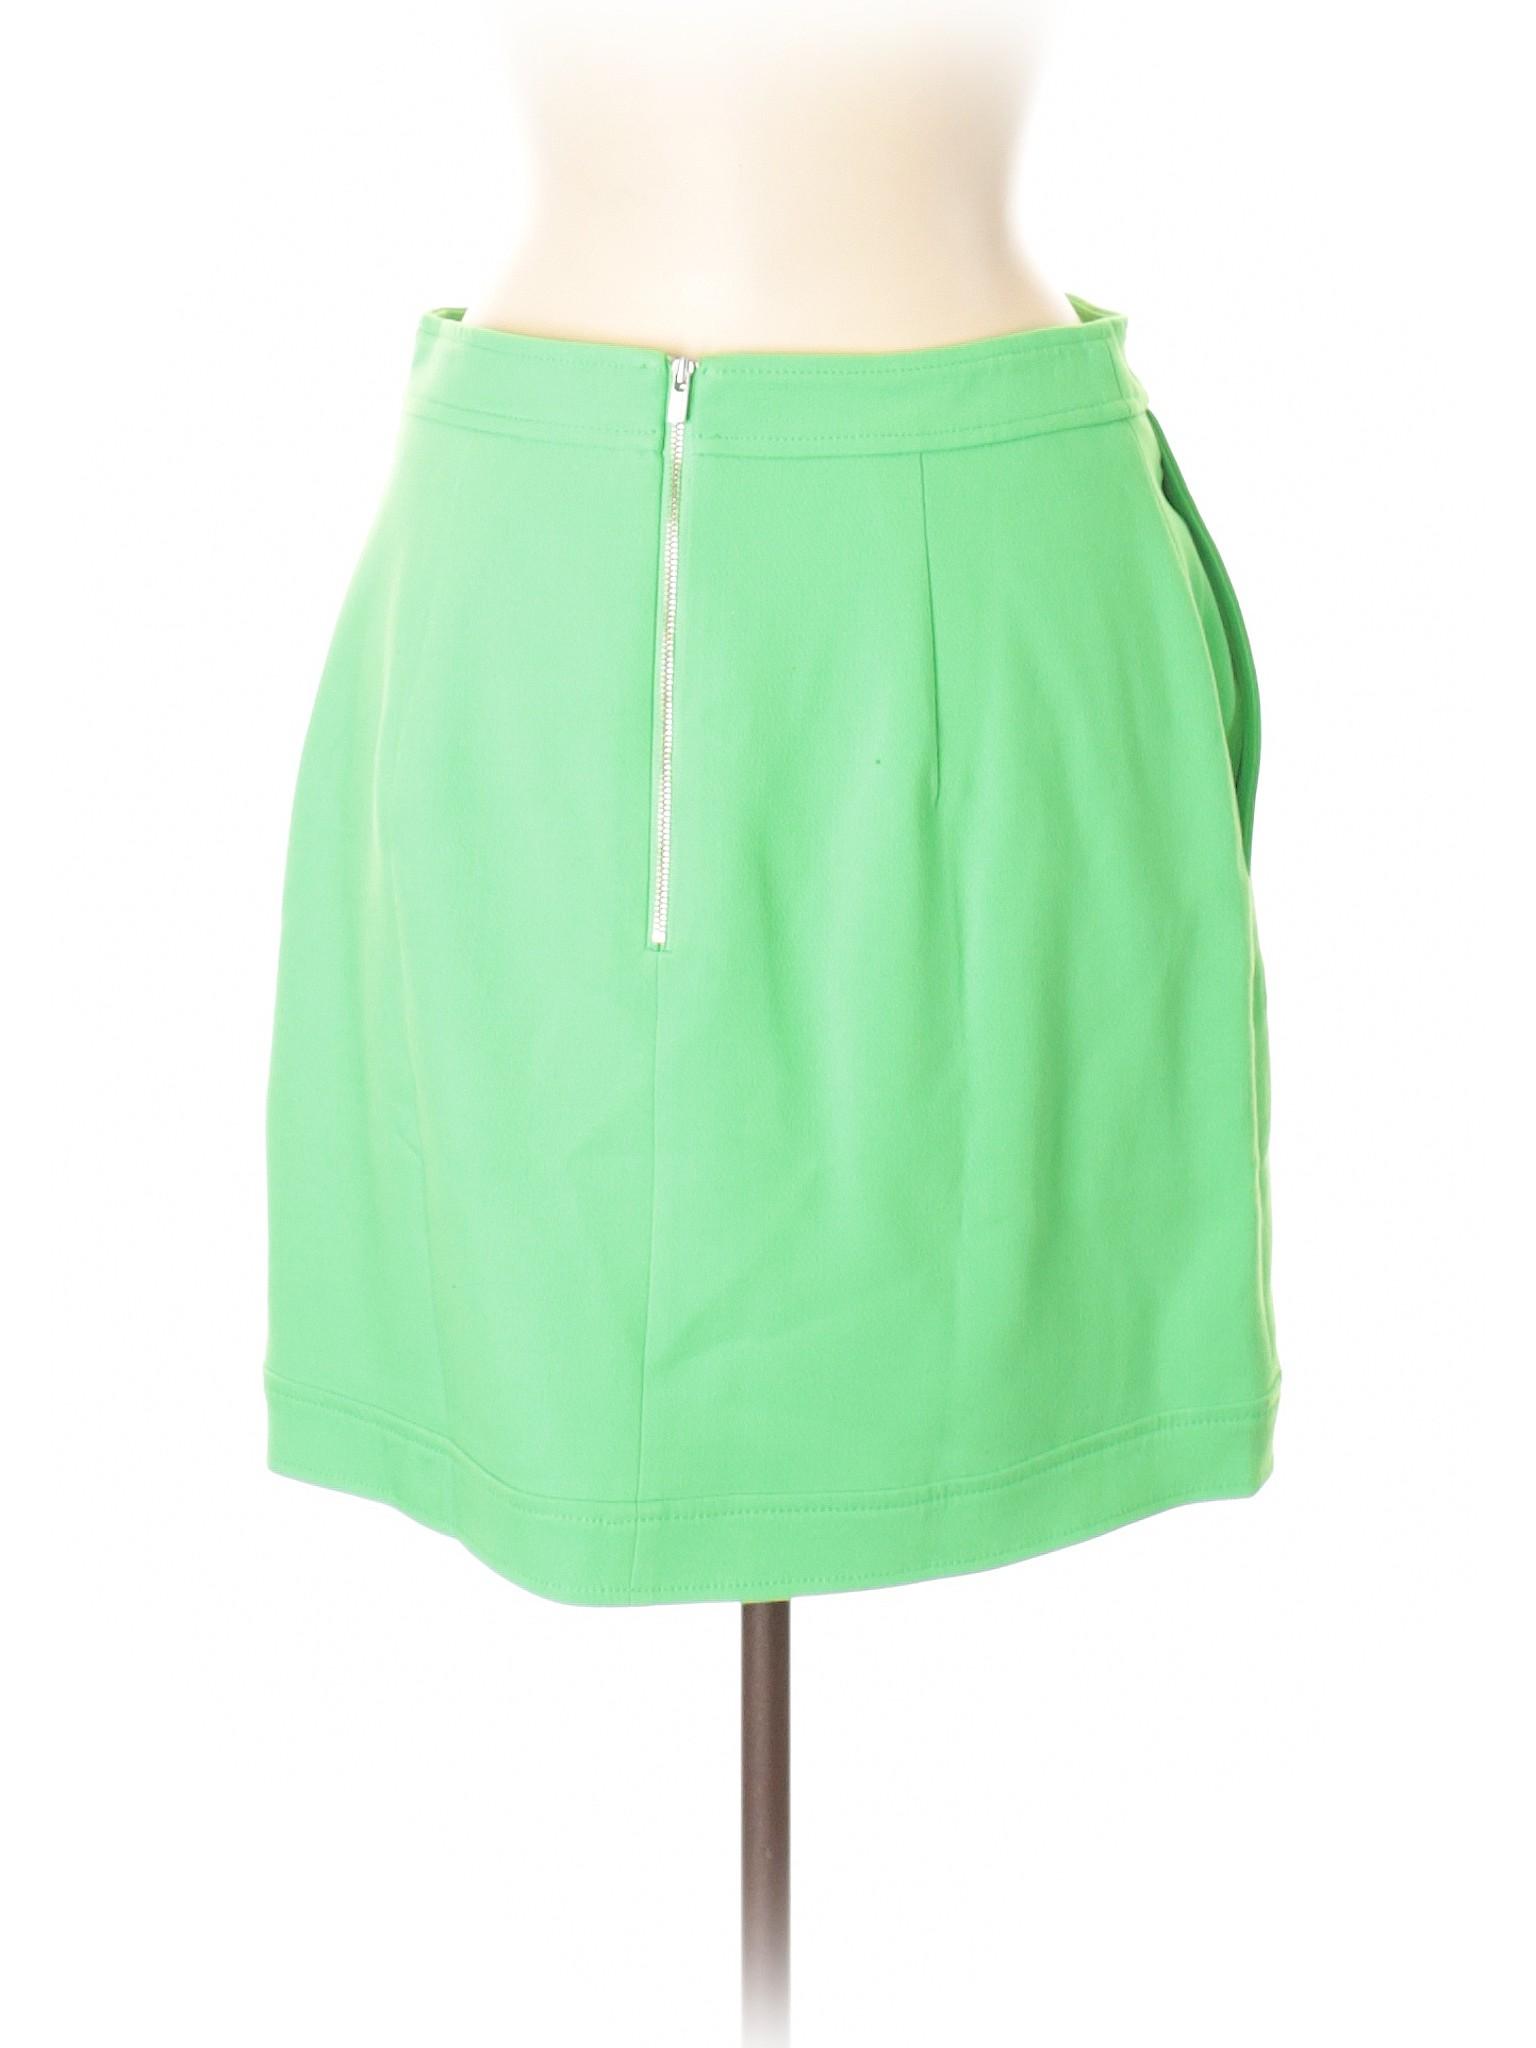 leisure Skirt Boutique Republic Casual Banana FSwZ4d